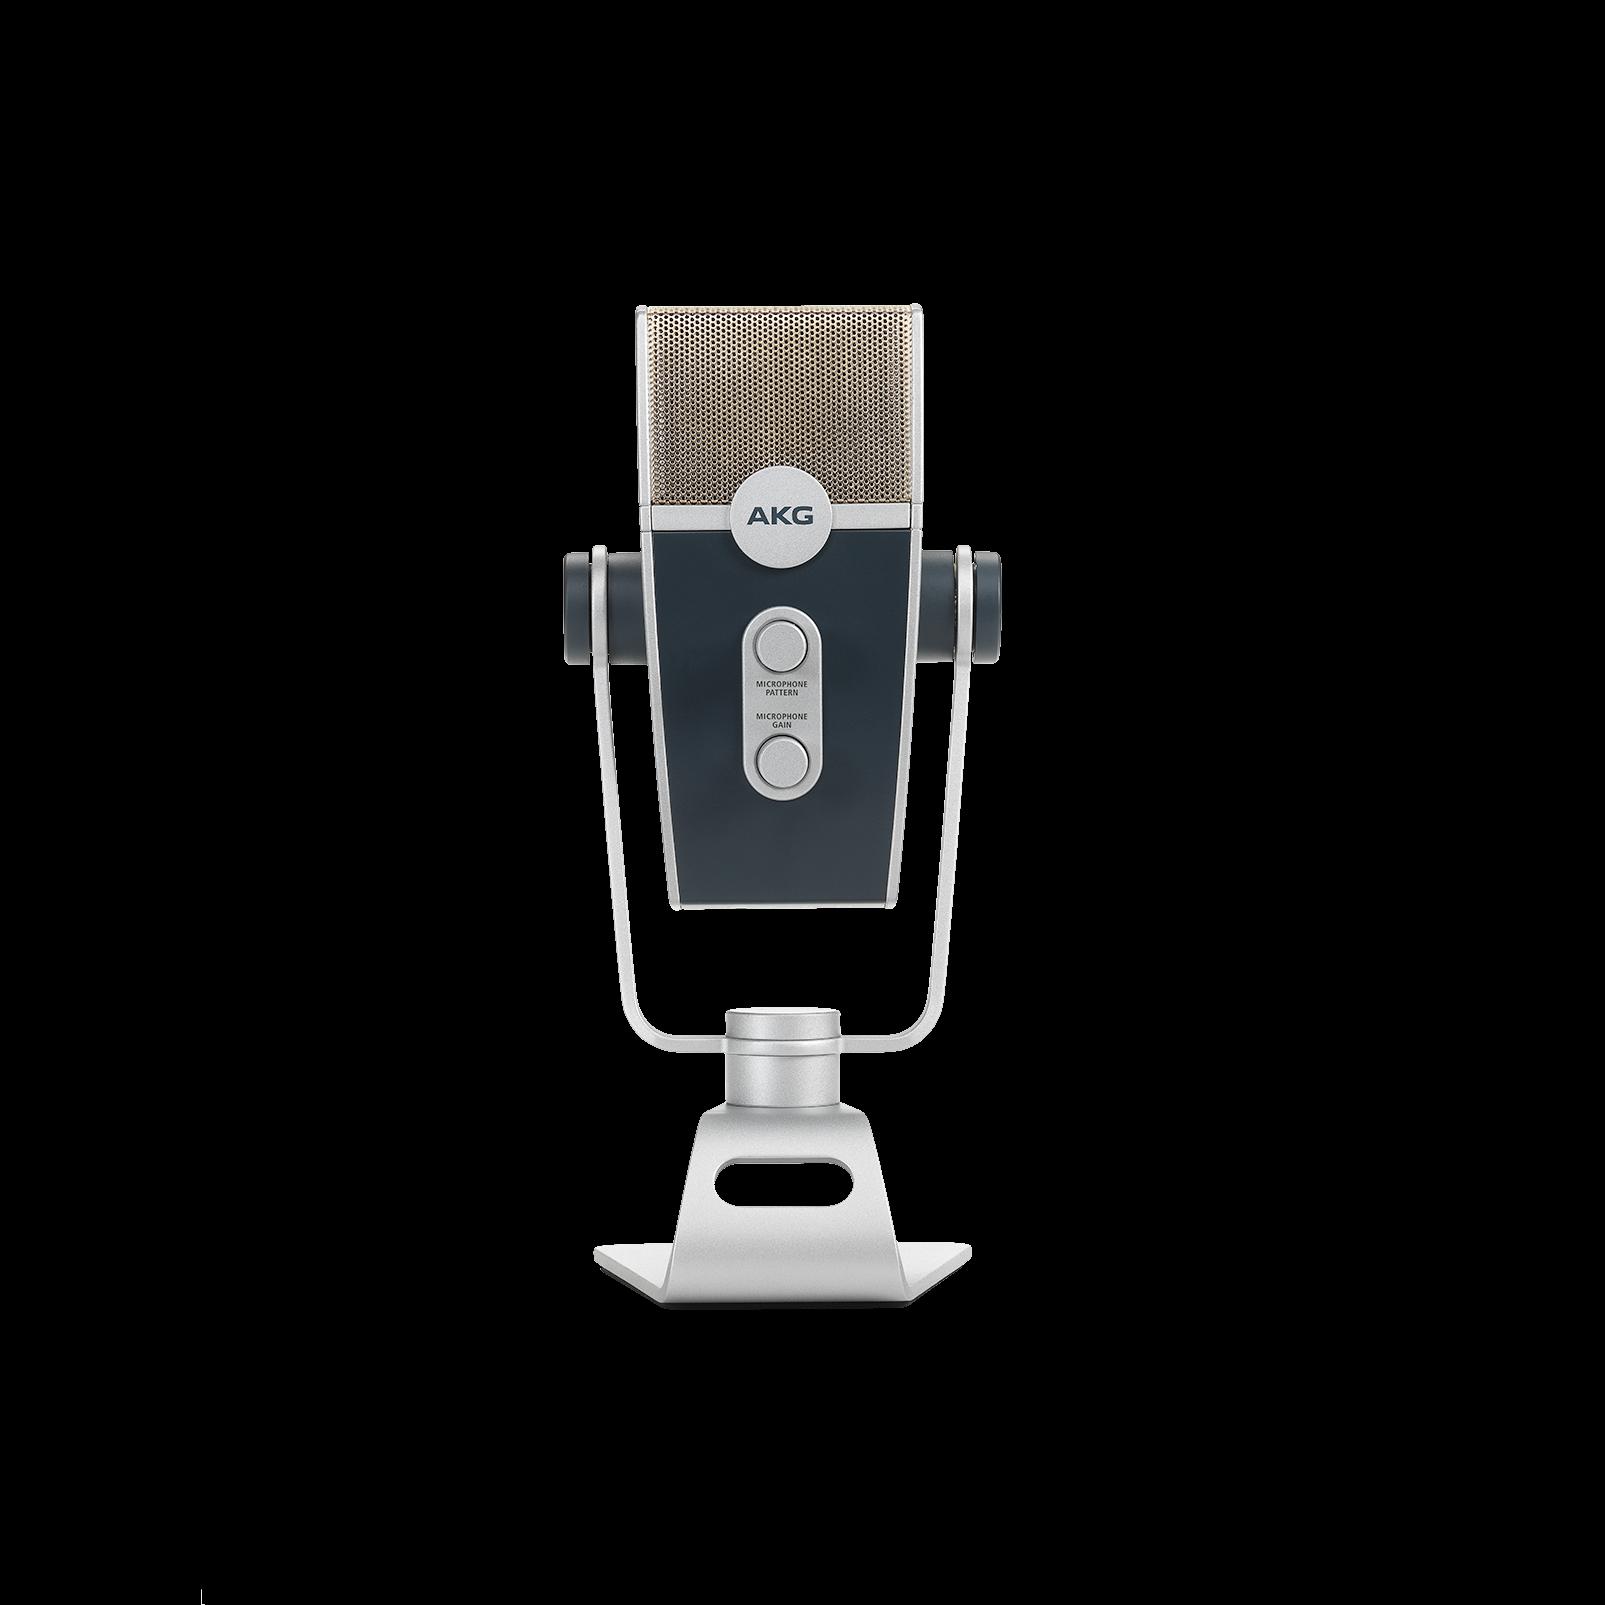 AKG Lyra - Silver - Ultra-HD Multimode USB Microphone  - Back